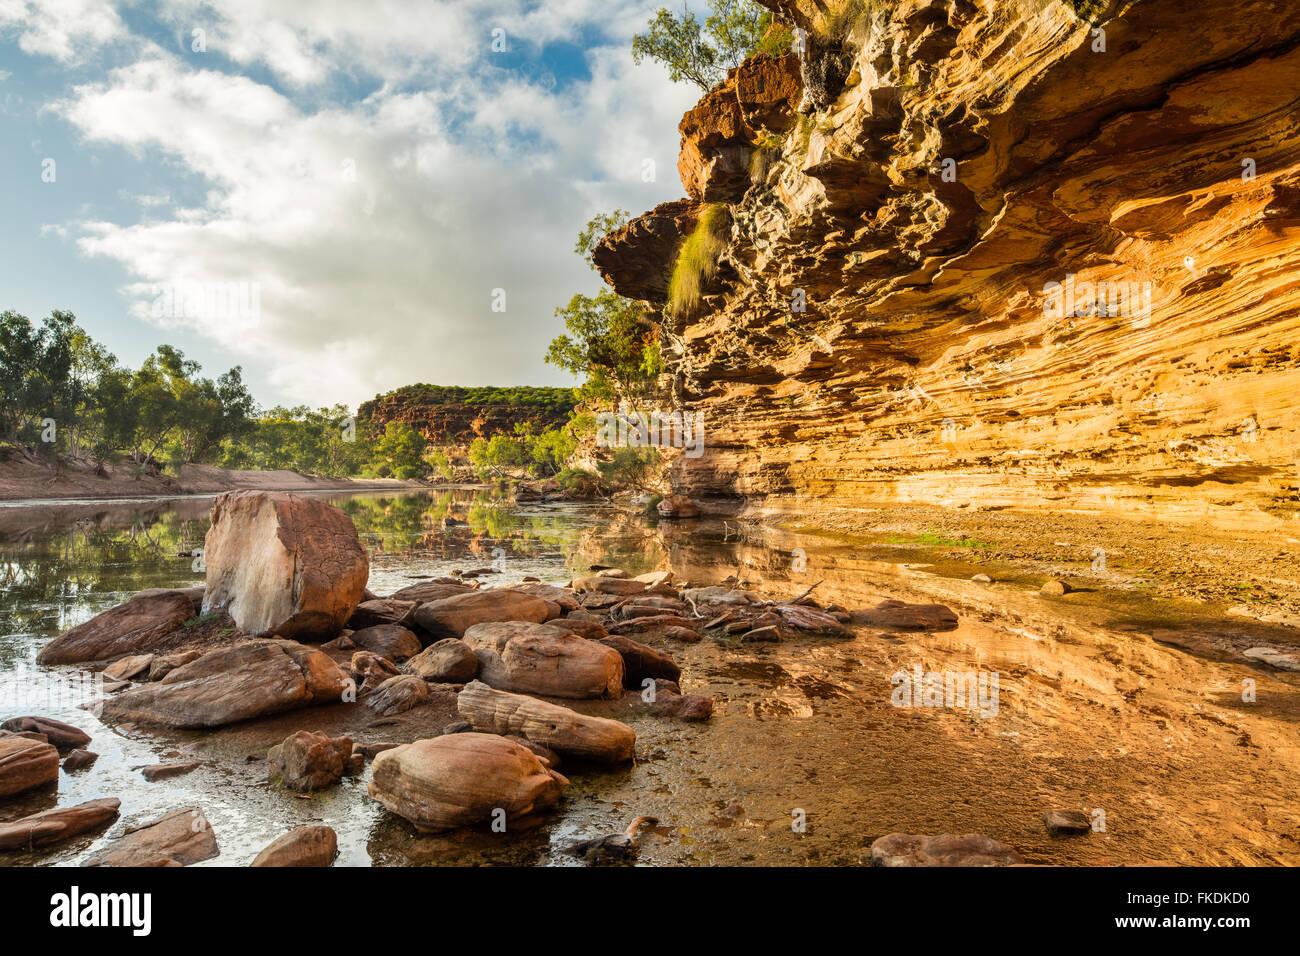 El Murchison River Gorge de Ross Graham, Kalbarri National Park, en el oeste de Australia Imagen De Stock